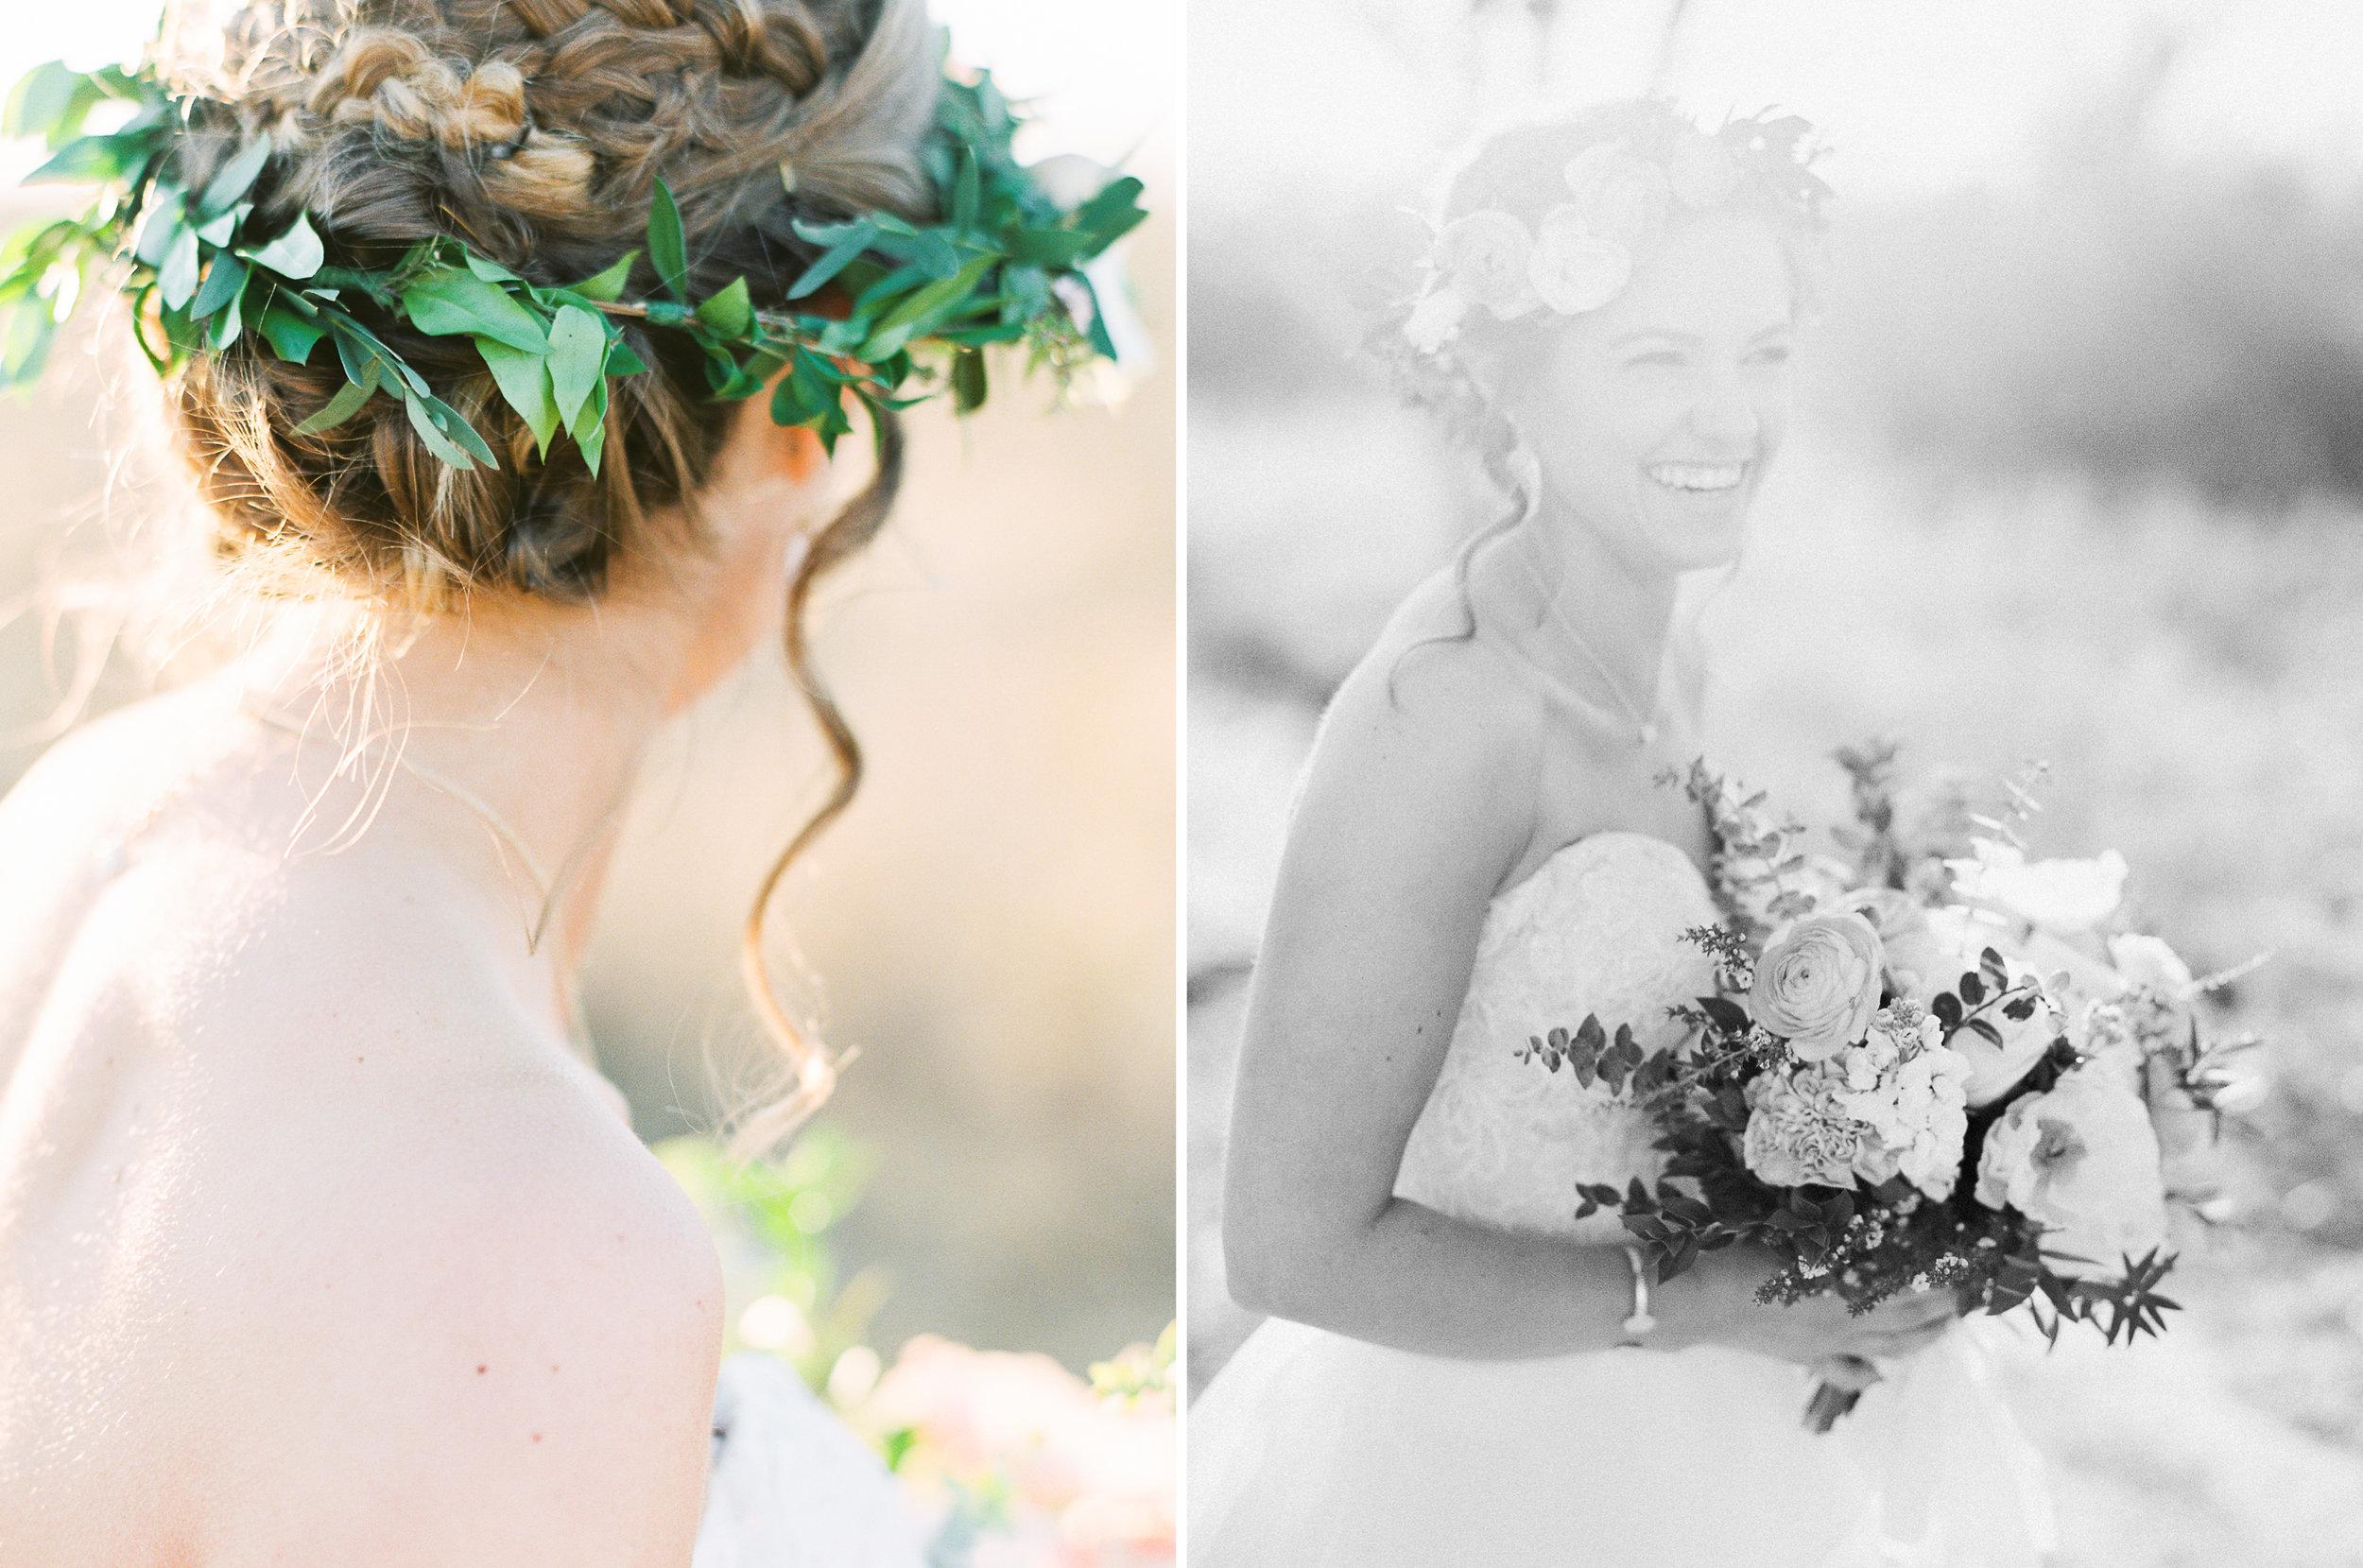 Chelsea's Spring Bridal Session | Spring Wedding Inspiration | Texas Film Wedding Photographer | britnidean.com